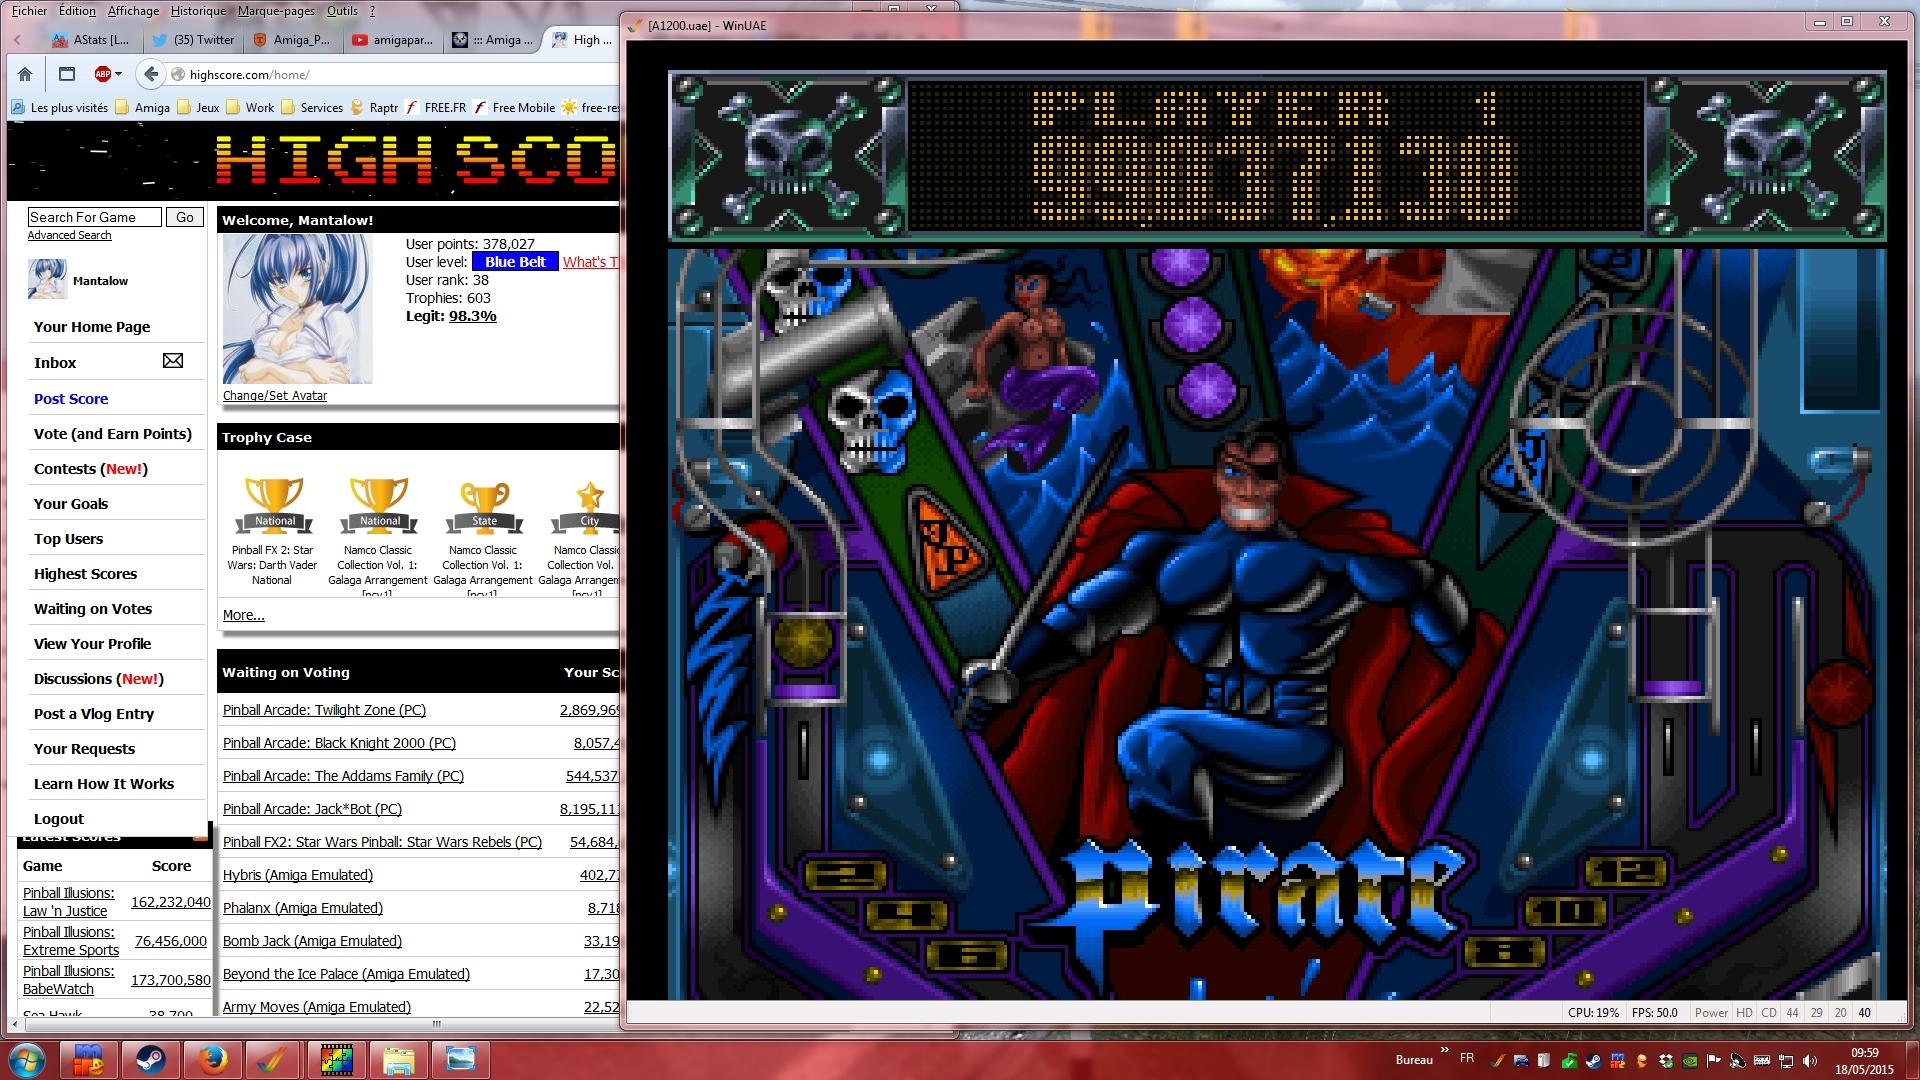 Mantalow: Slam Tilt: The Pirate (Amiga Emulated) 99,037,130 points on 2015-05-18 03:24:40